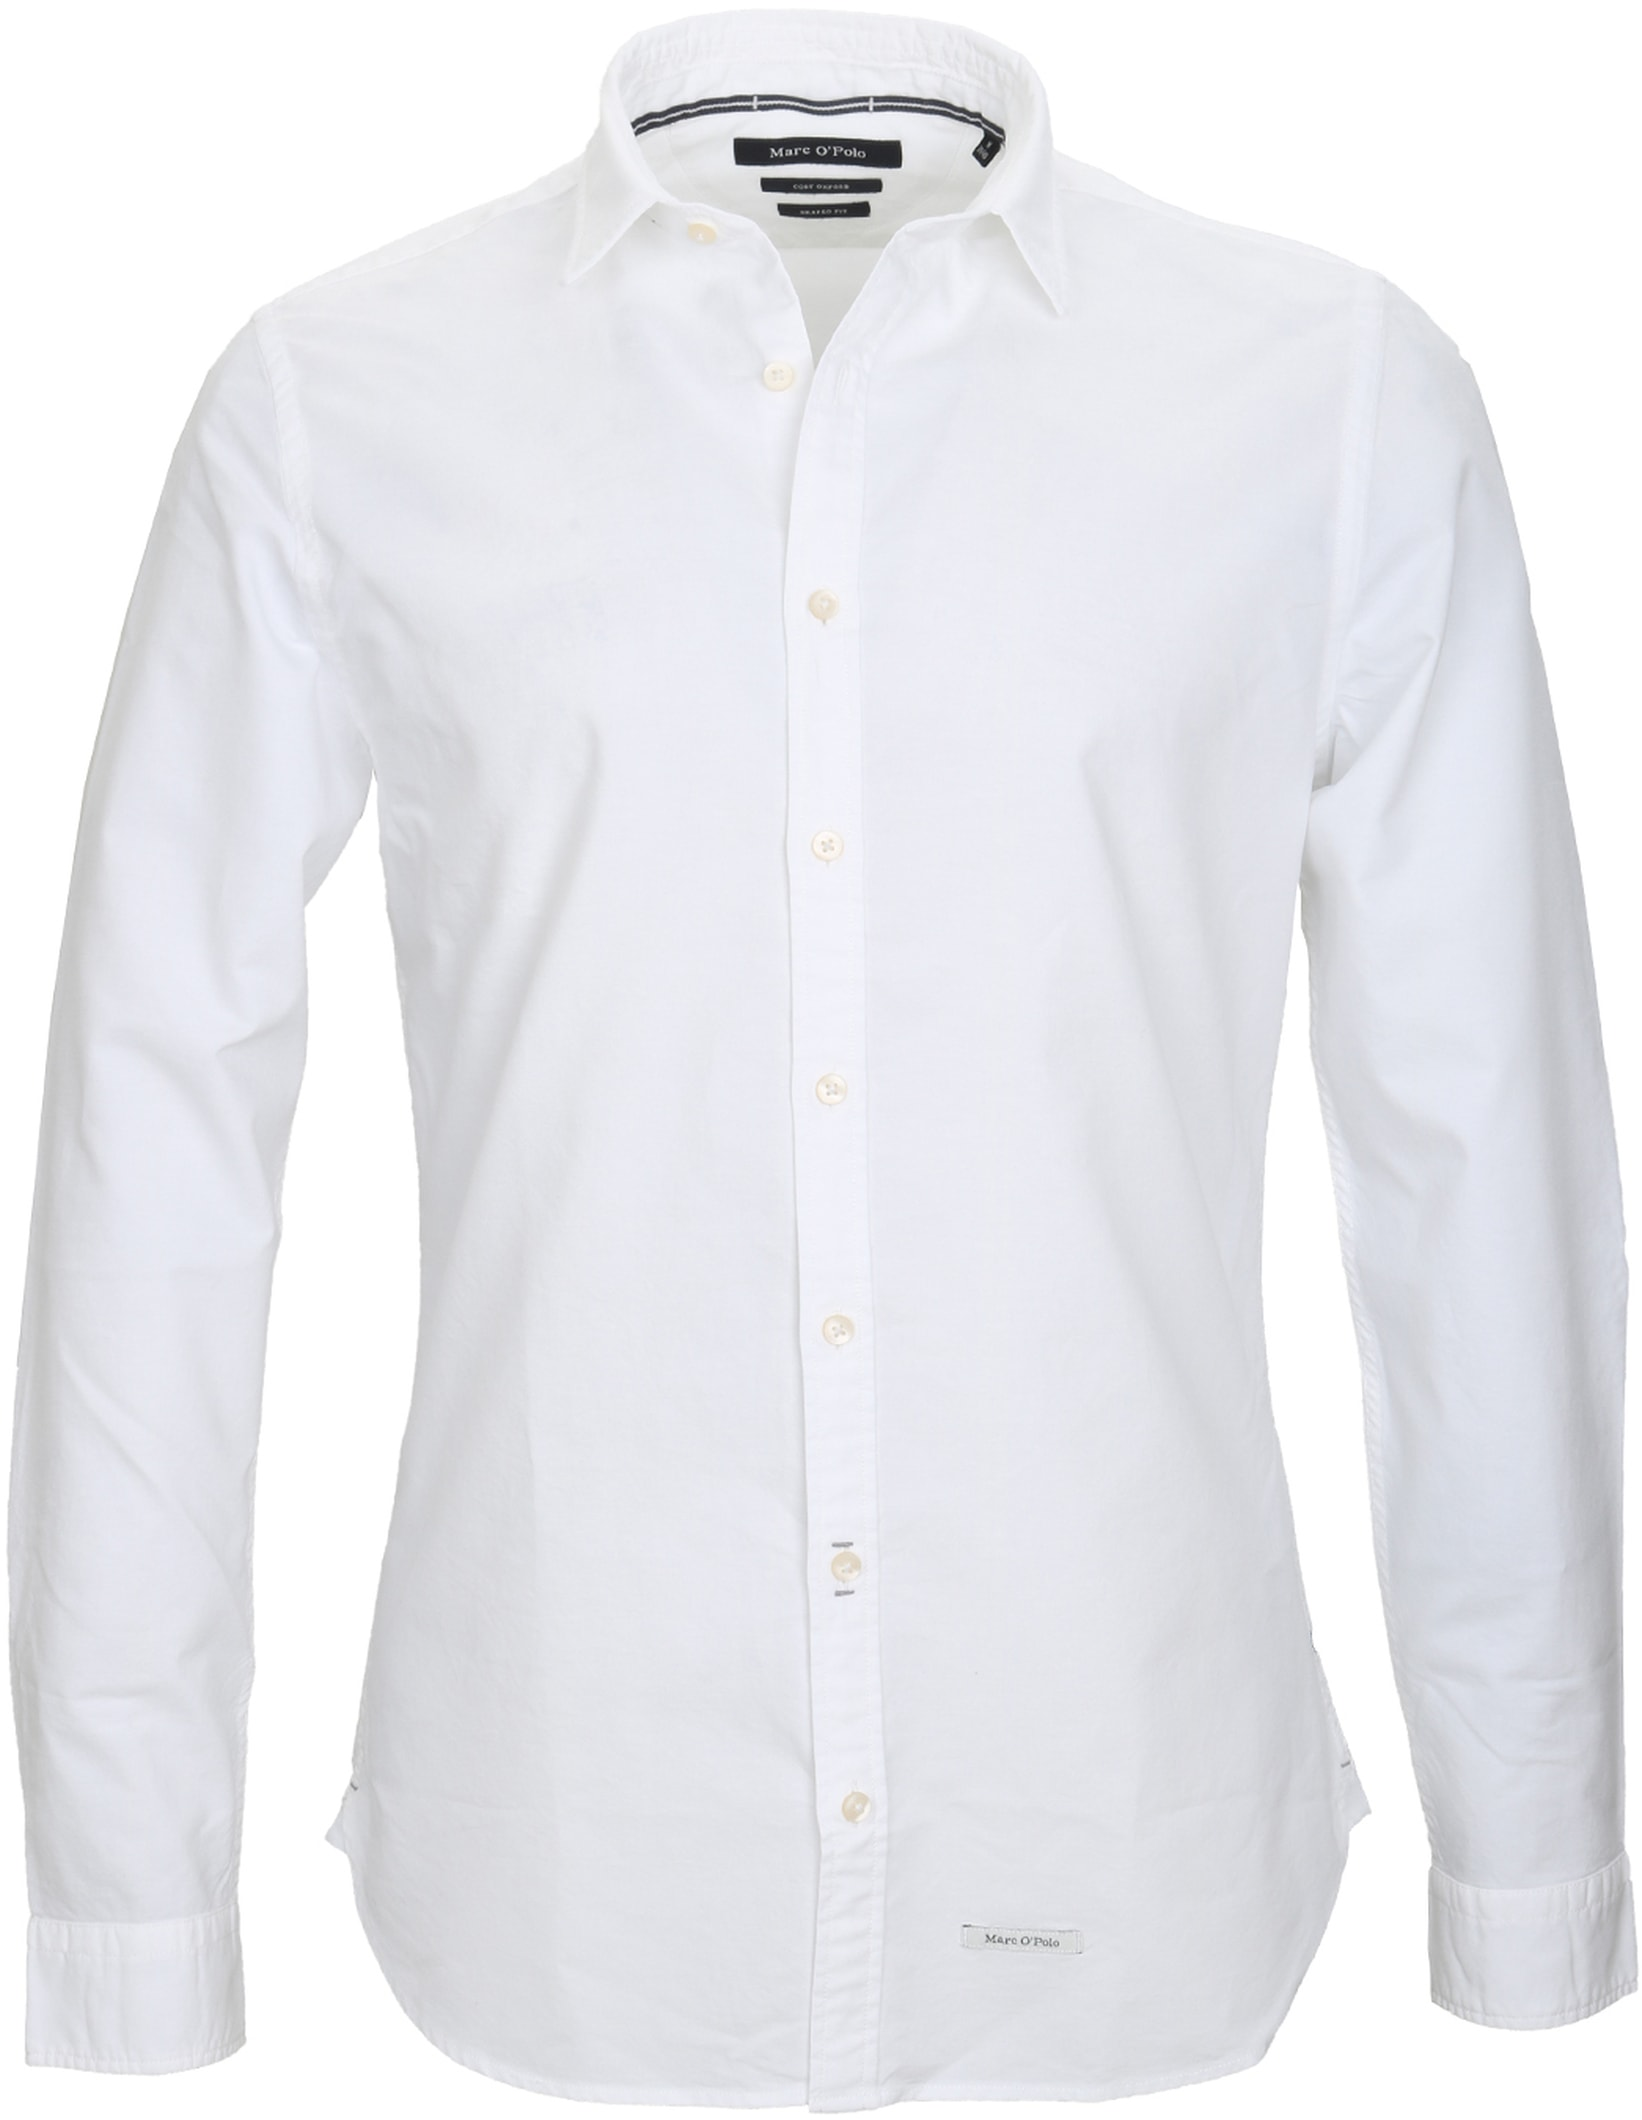 Marc O'Polo Overhemd Wit foto 0